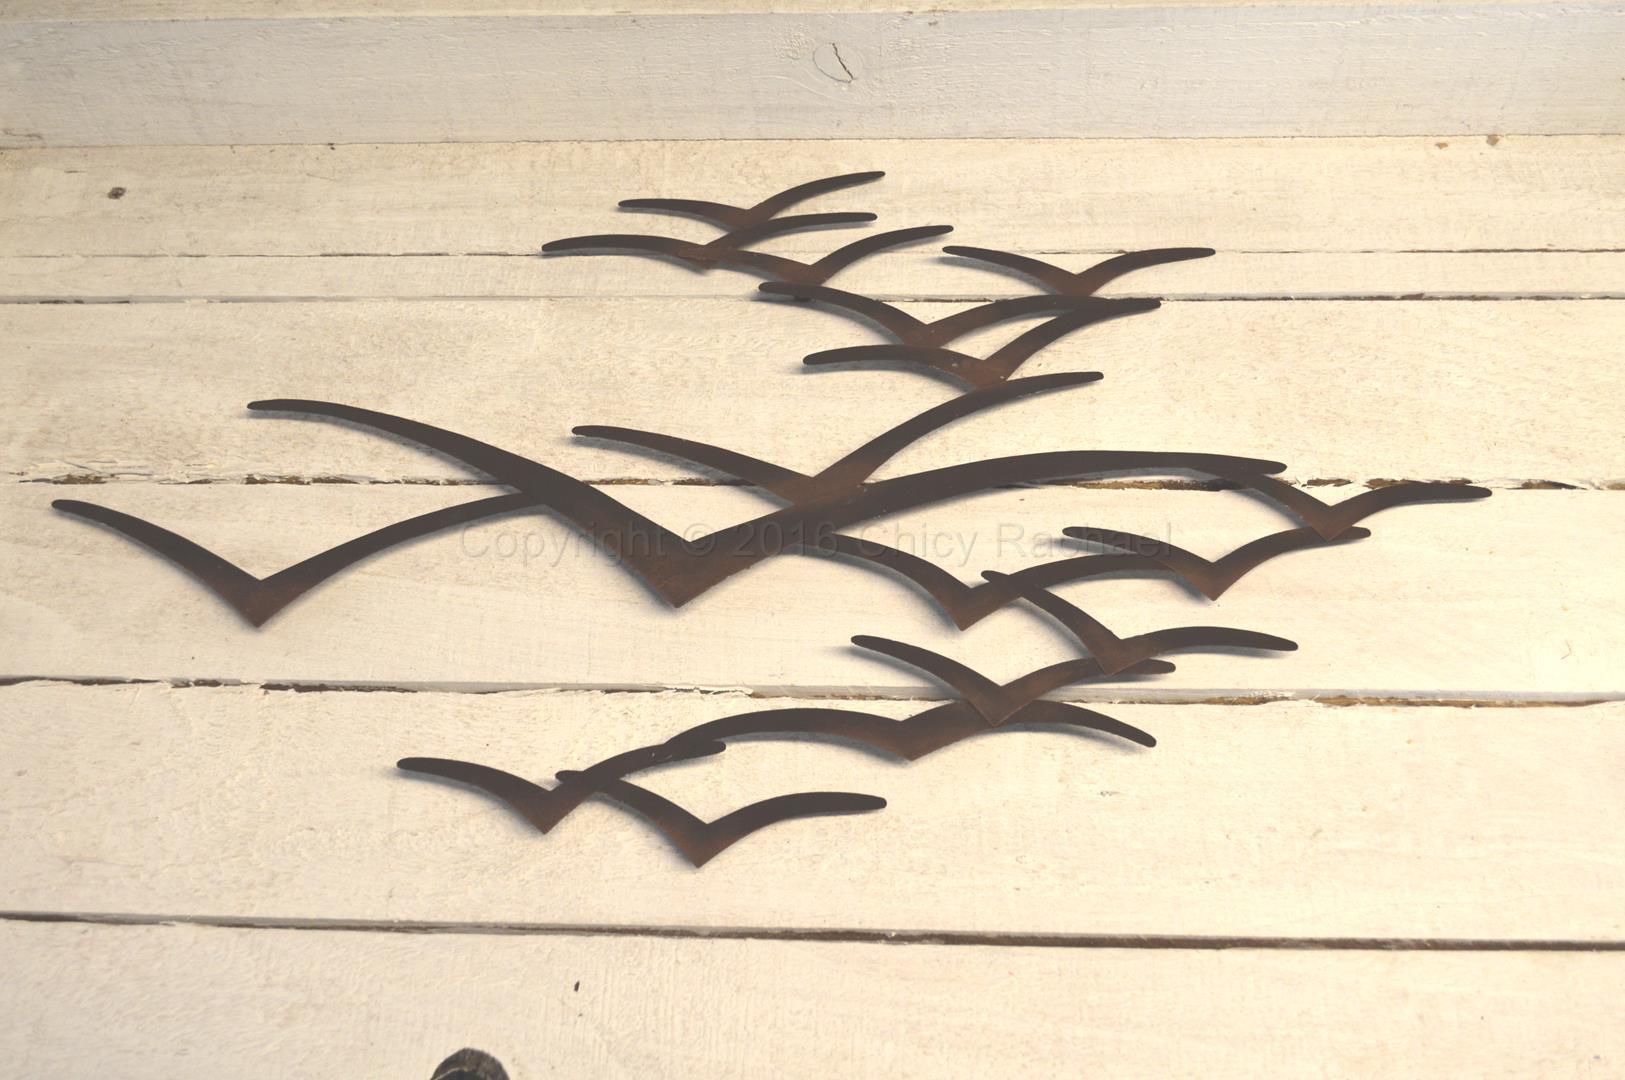 Brown Metal Seagulls In Flight Wall Art